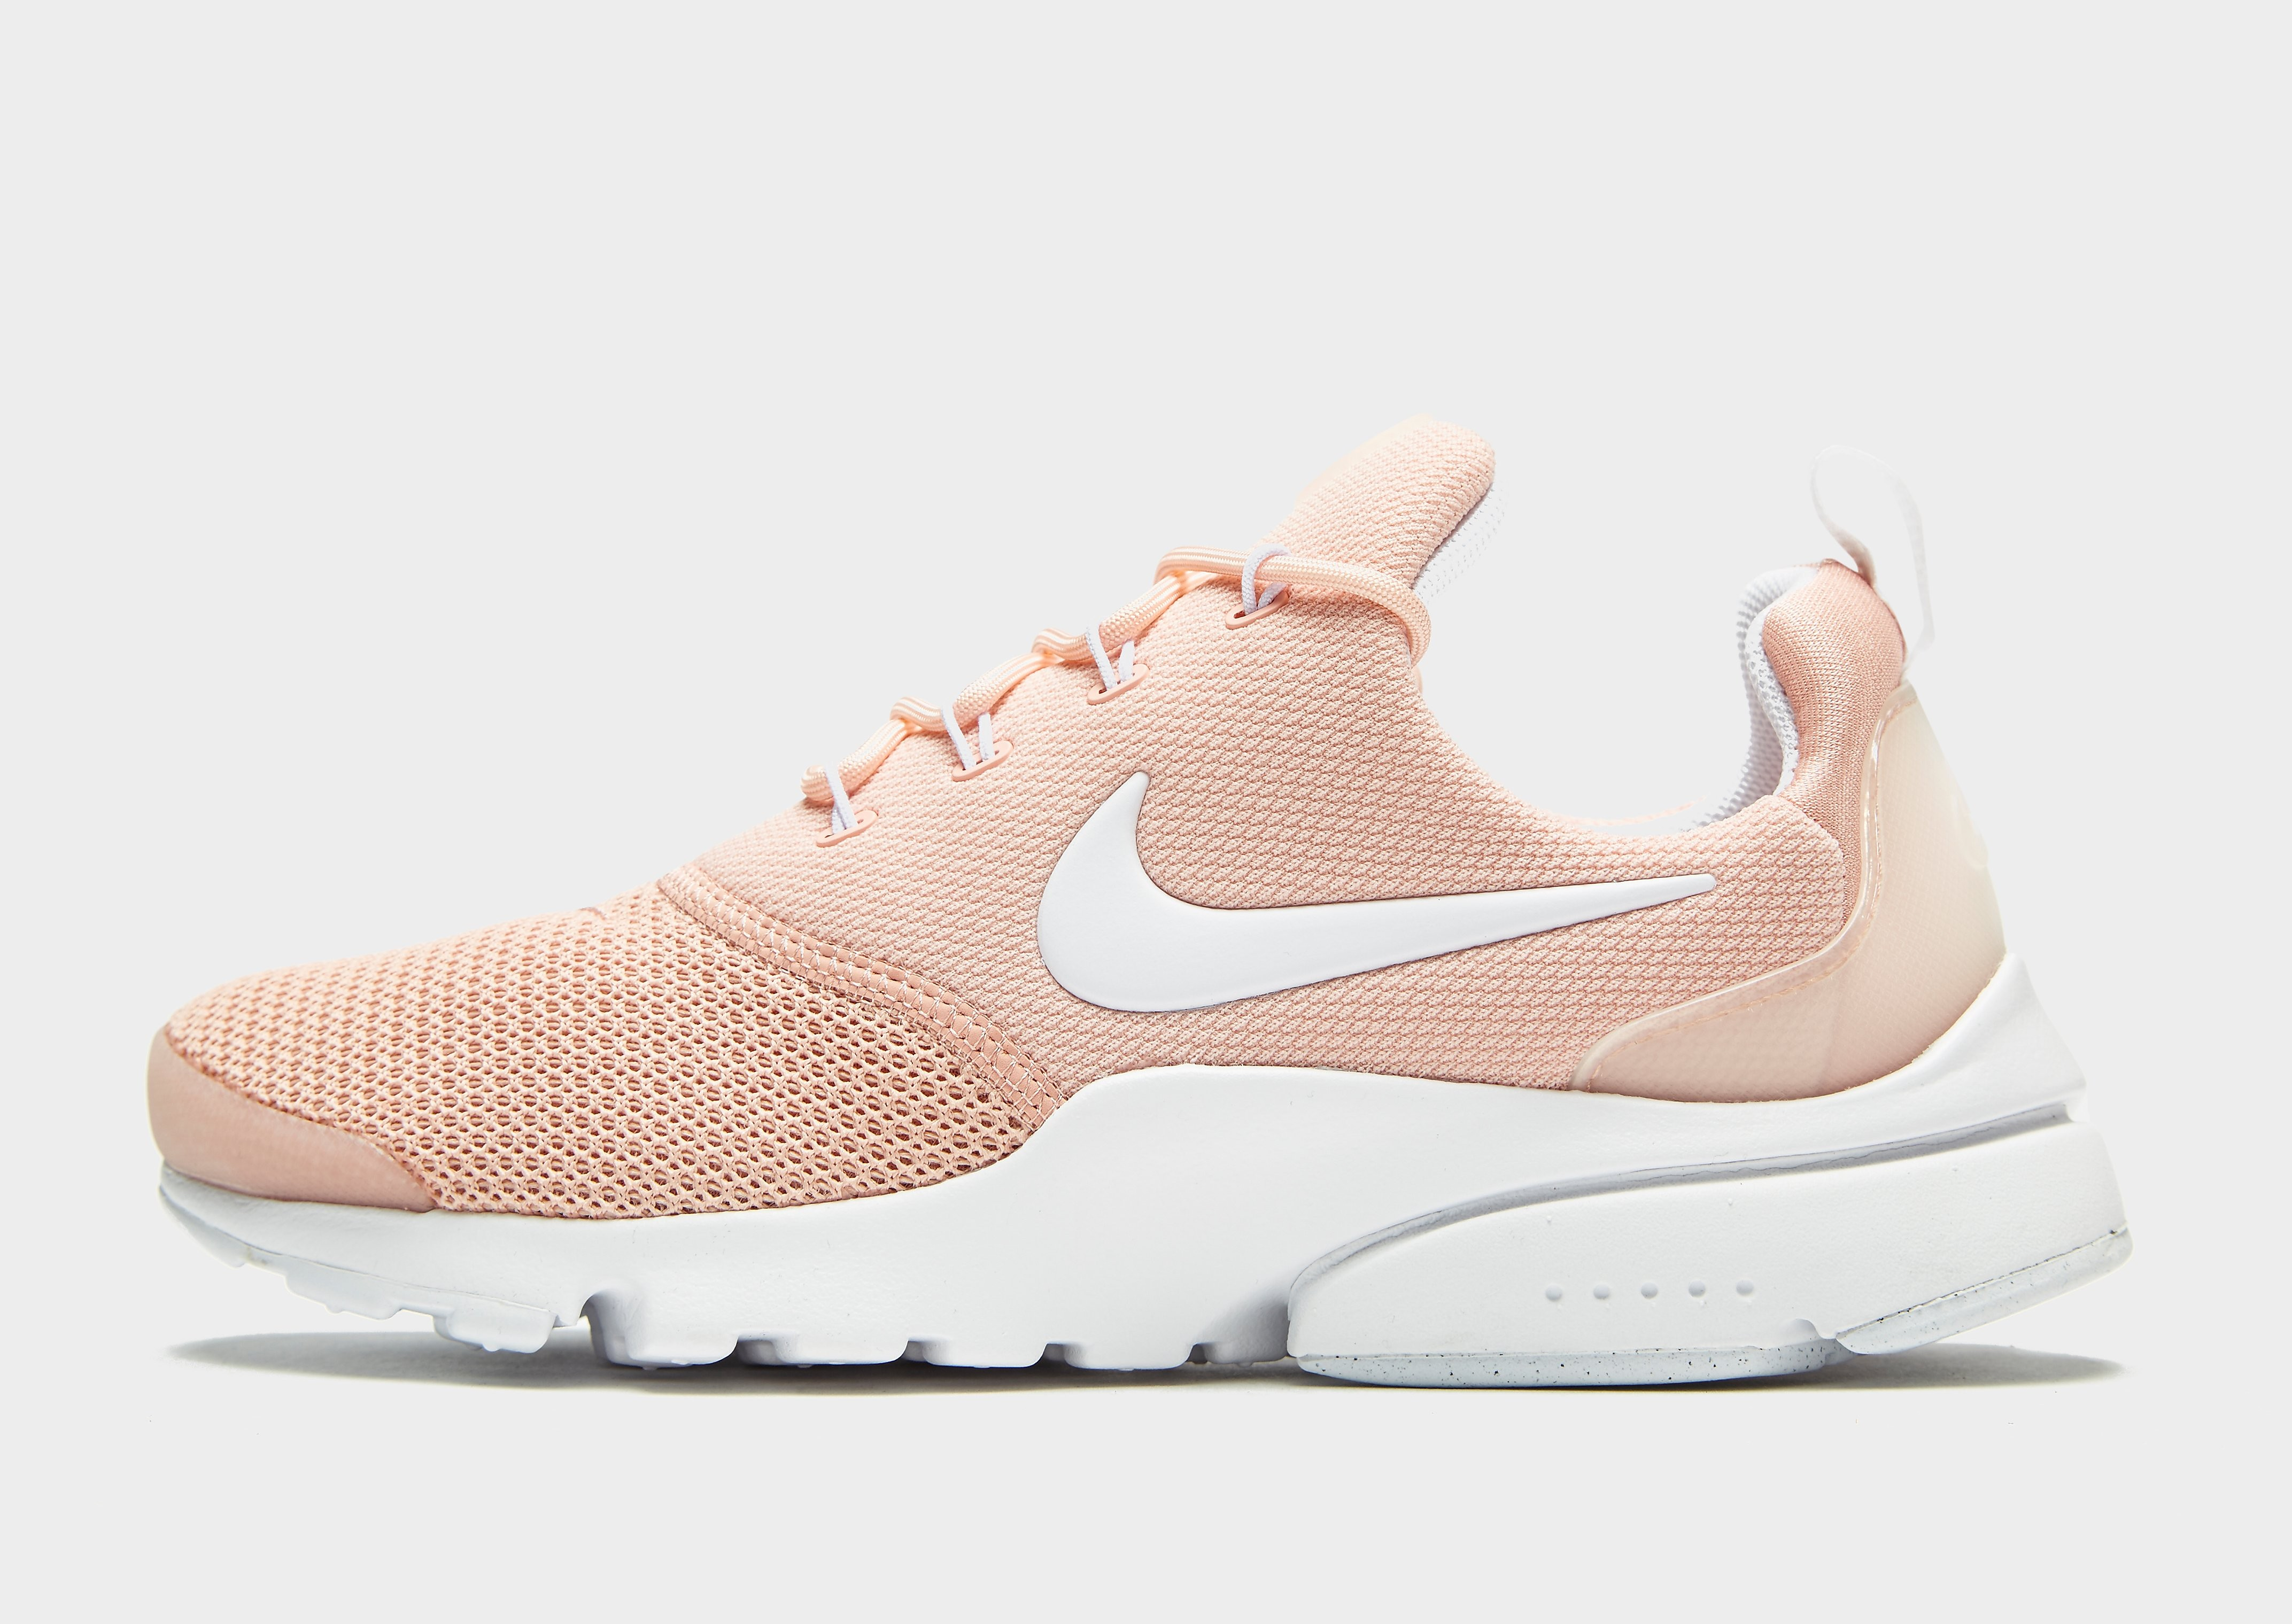 Nike Air Presto Fly Women's